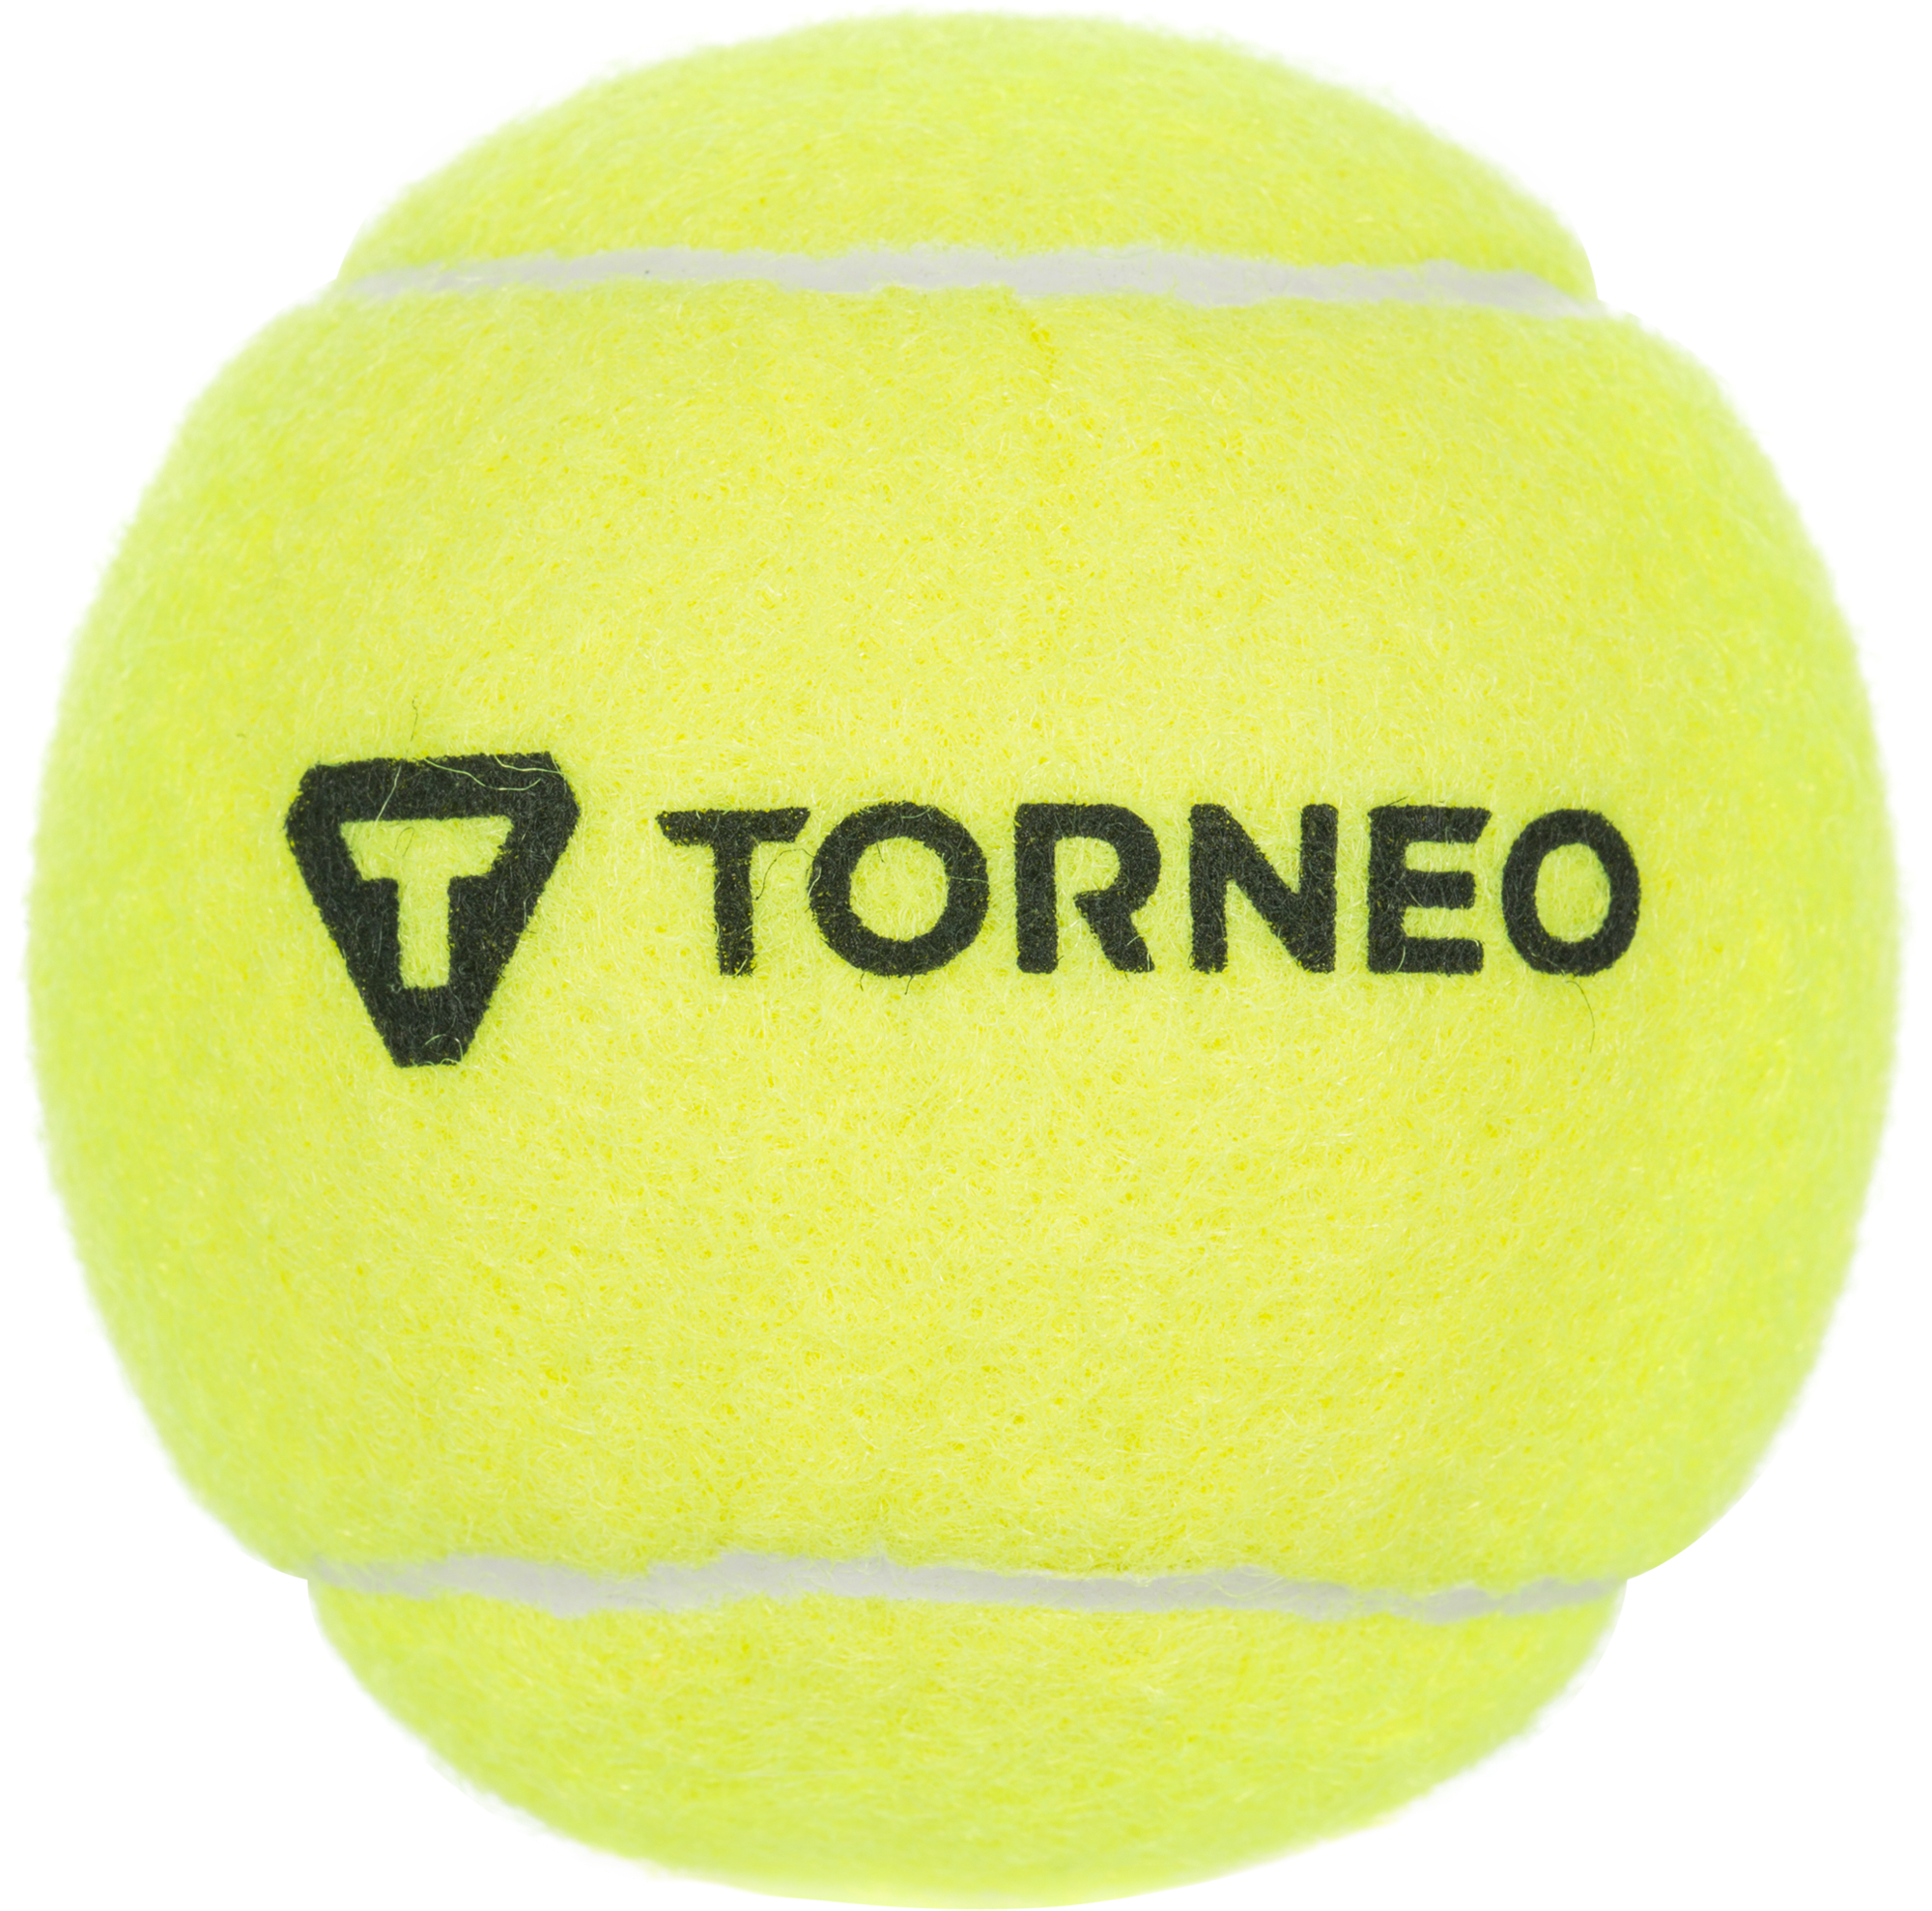 Torneo Мяч для большого тенниса Torneo сетки для тенниса большого